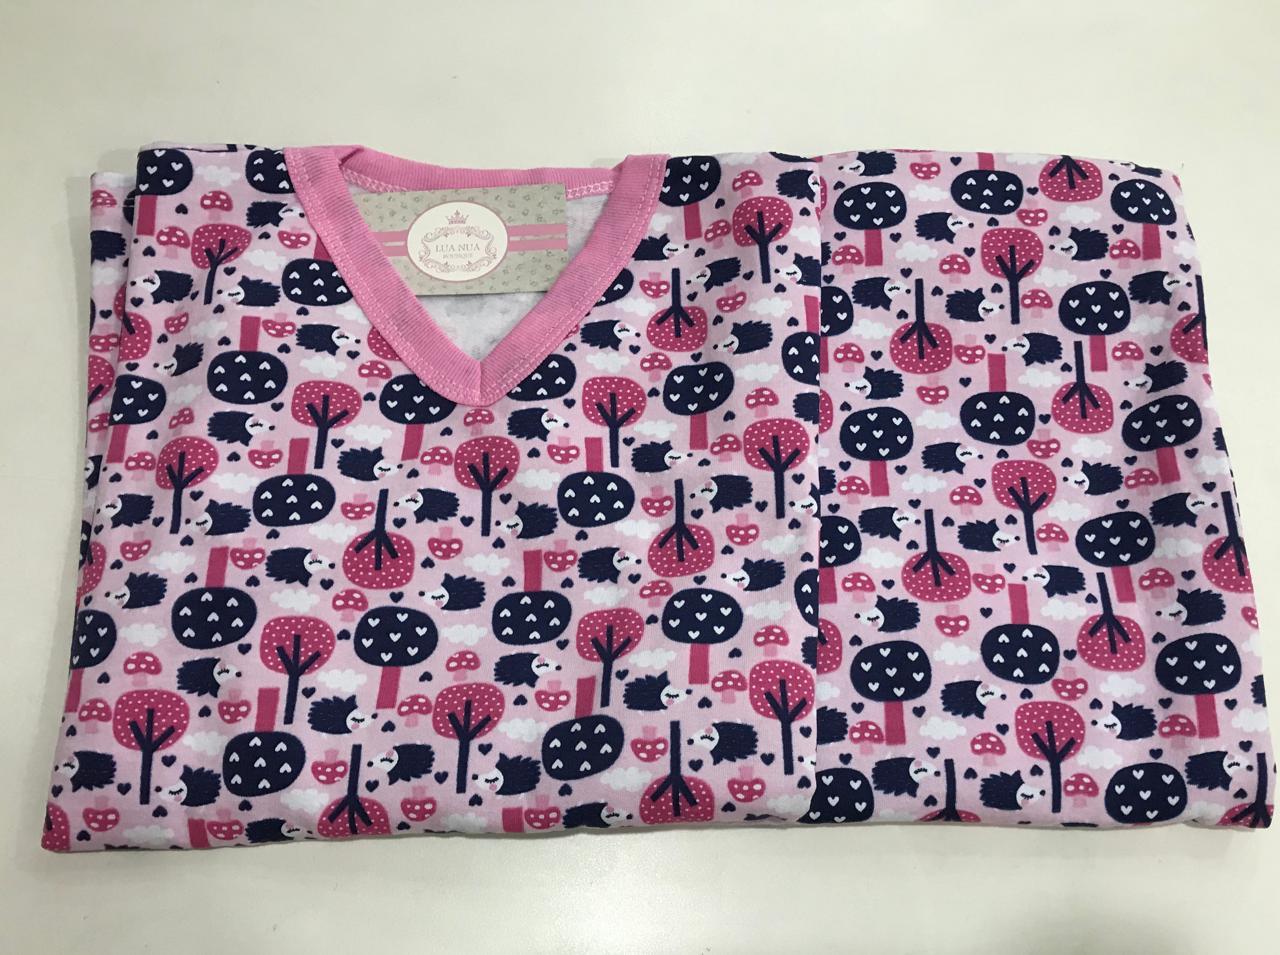 Pijama Feminino Infantil Juvenil  Mafessoni  Arvore Coração Rosa Moletinho Flanelado 200600